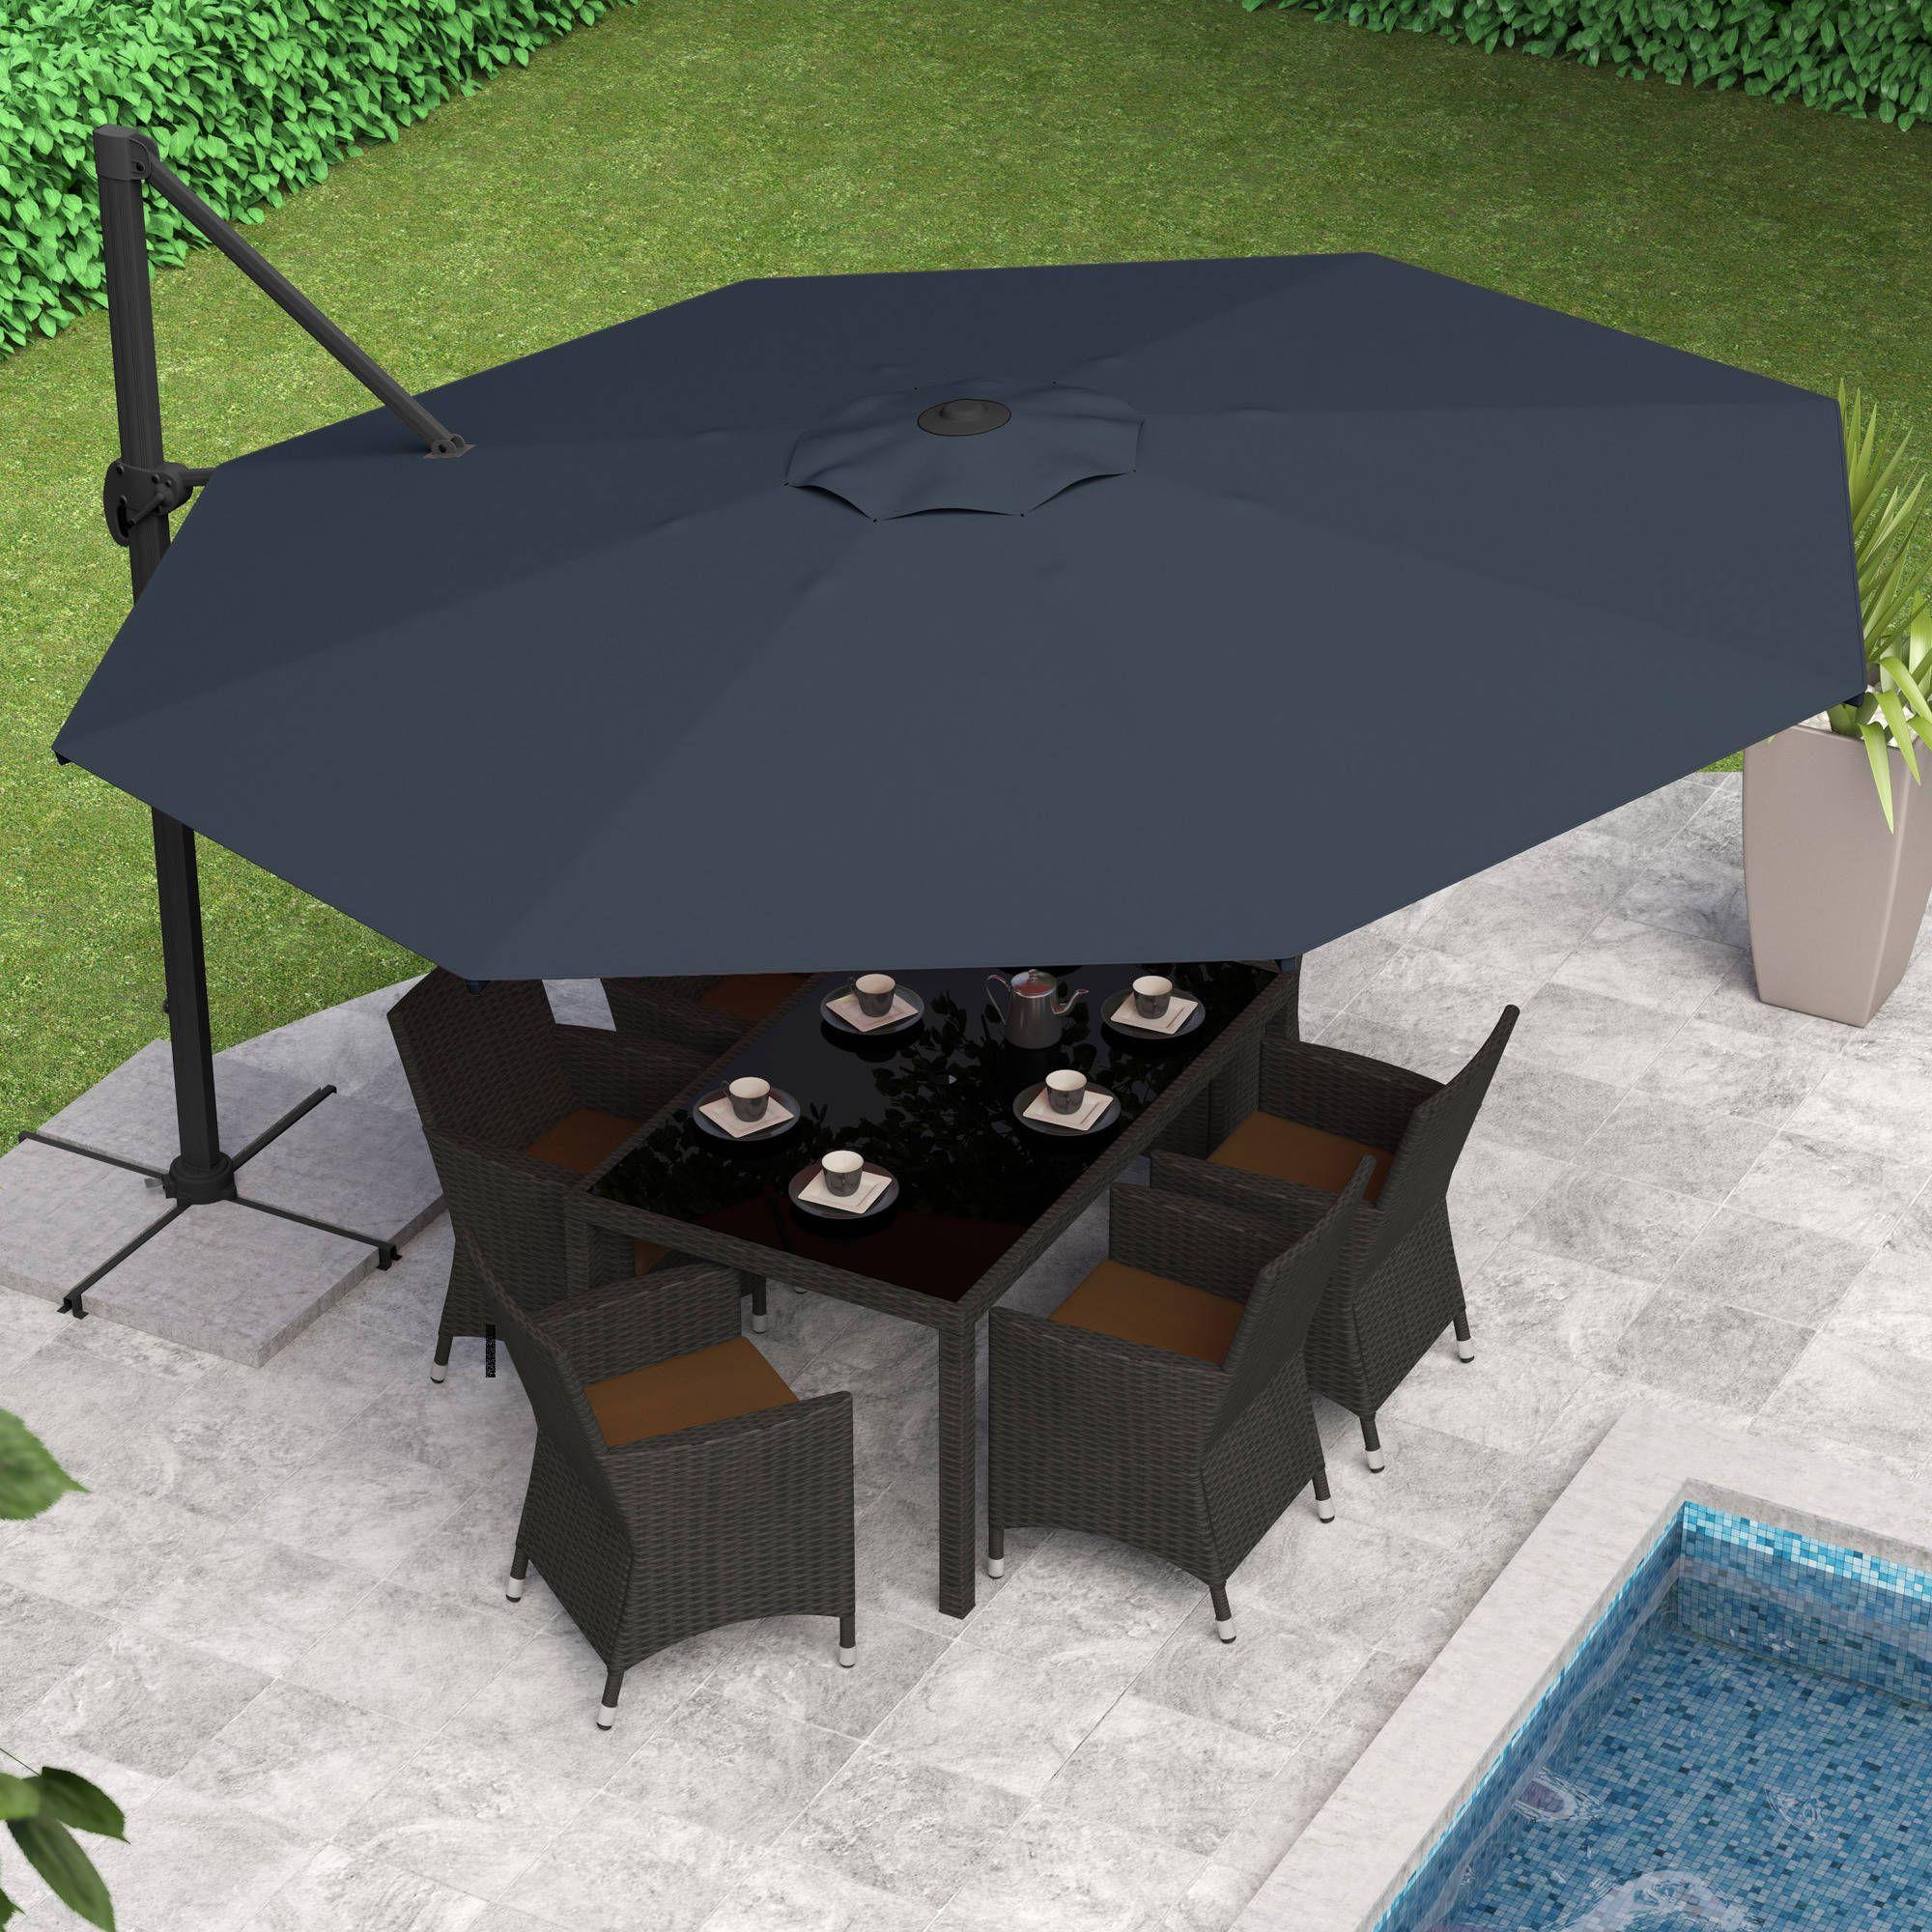 Best Outdoor Sonnenschirm Ft Regenschirm Beleuchtete Ampelschirm Riesigen Pool Dach Schlafzimmer